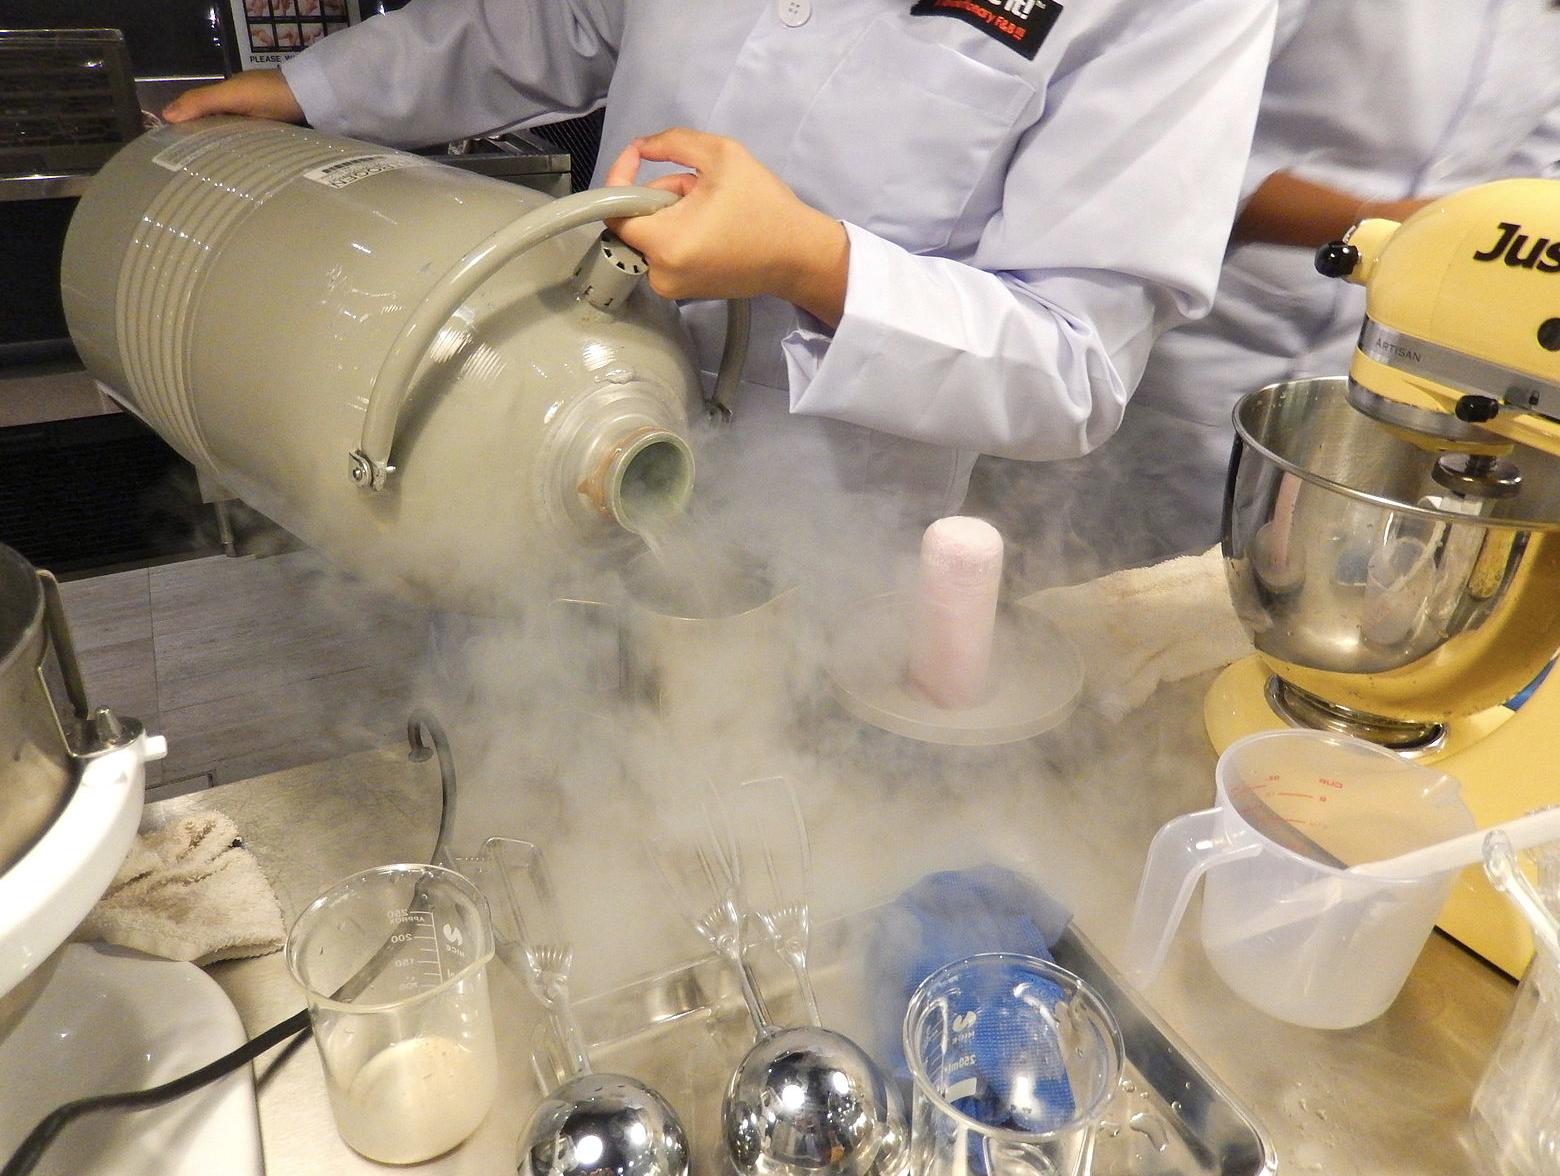 making an ice cream